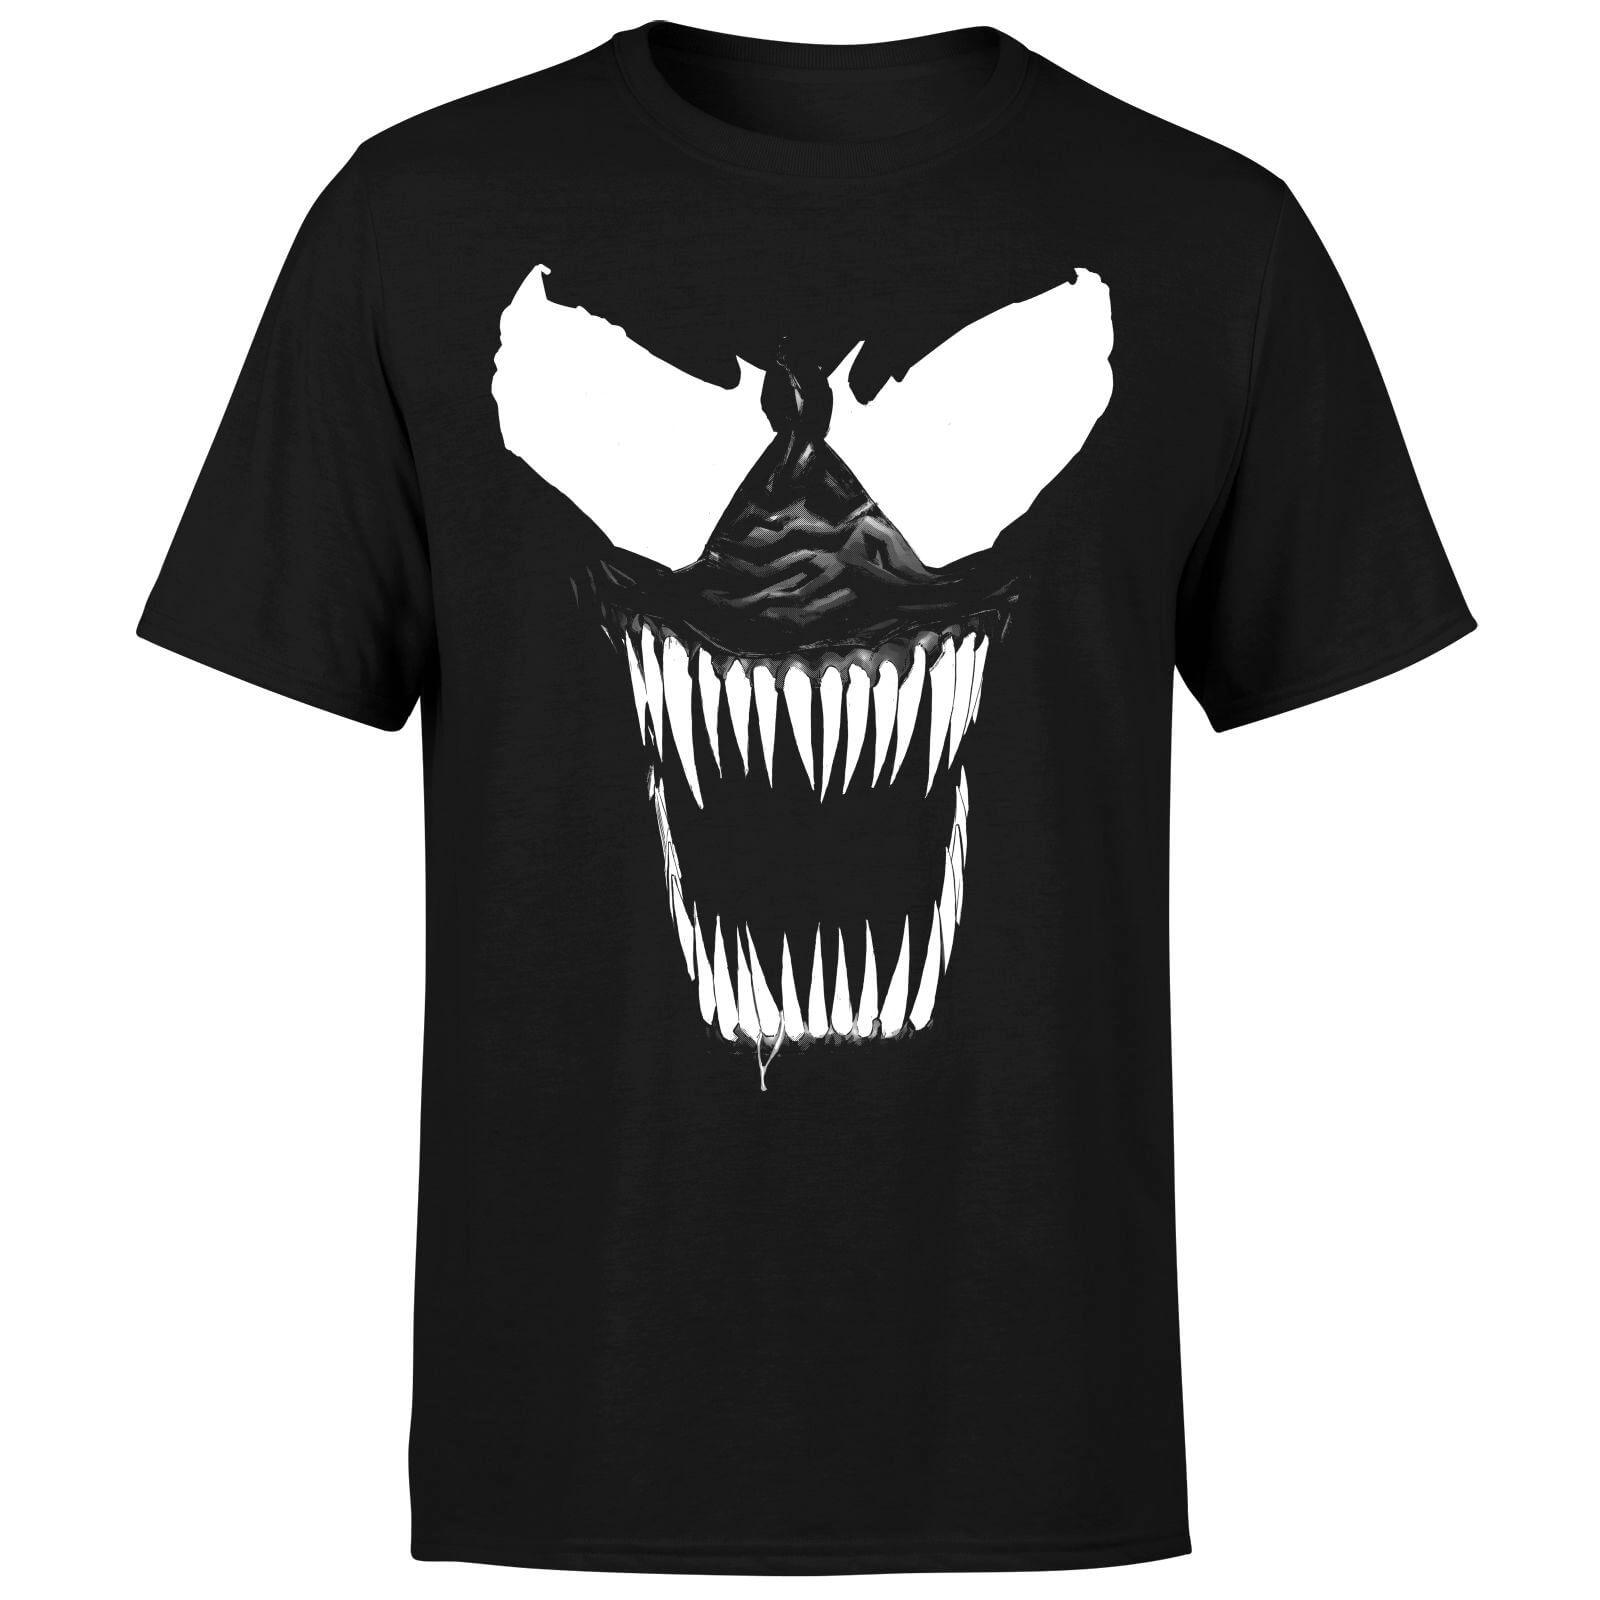 Venom Bare Teeth Shirt bei Zavvi